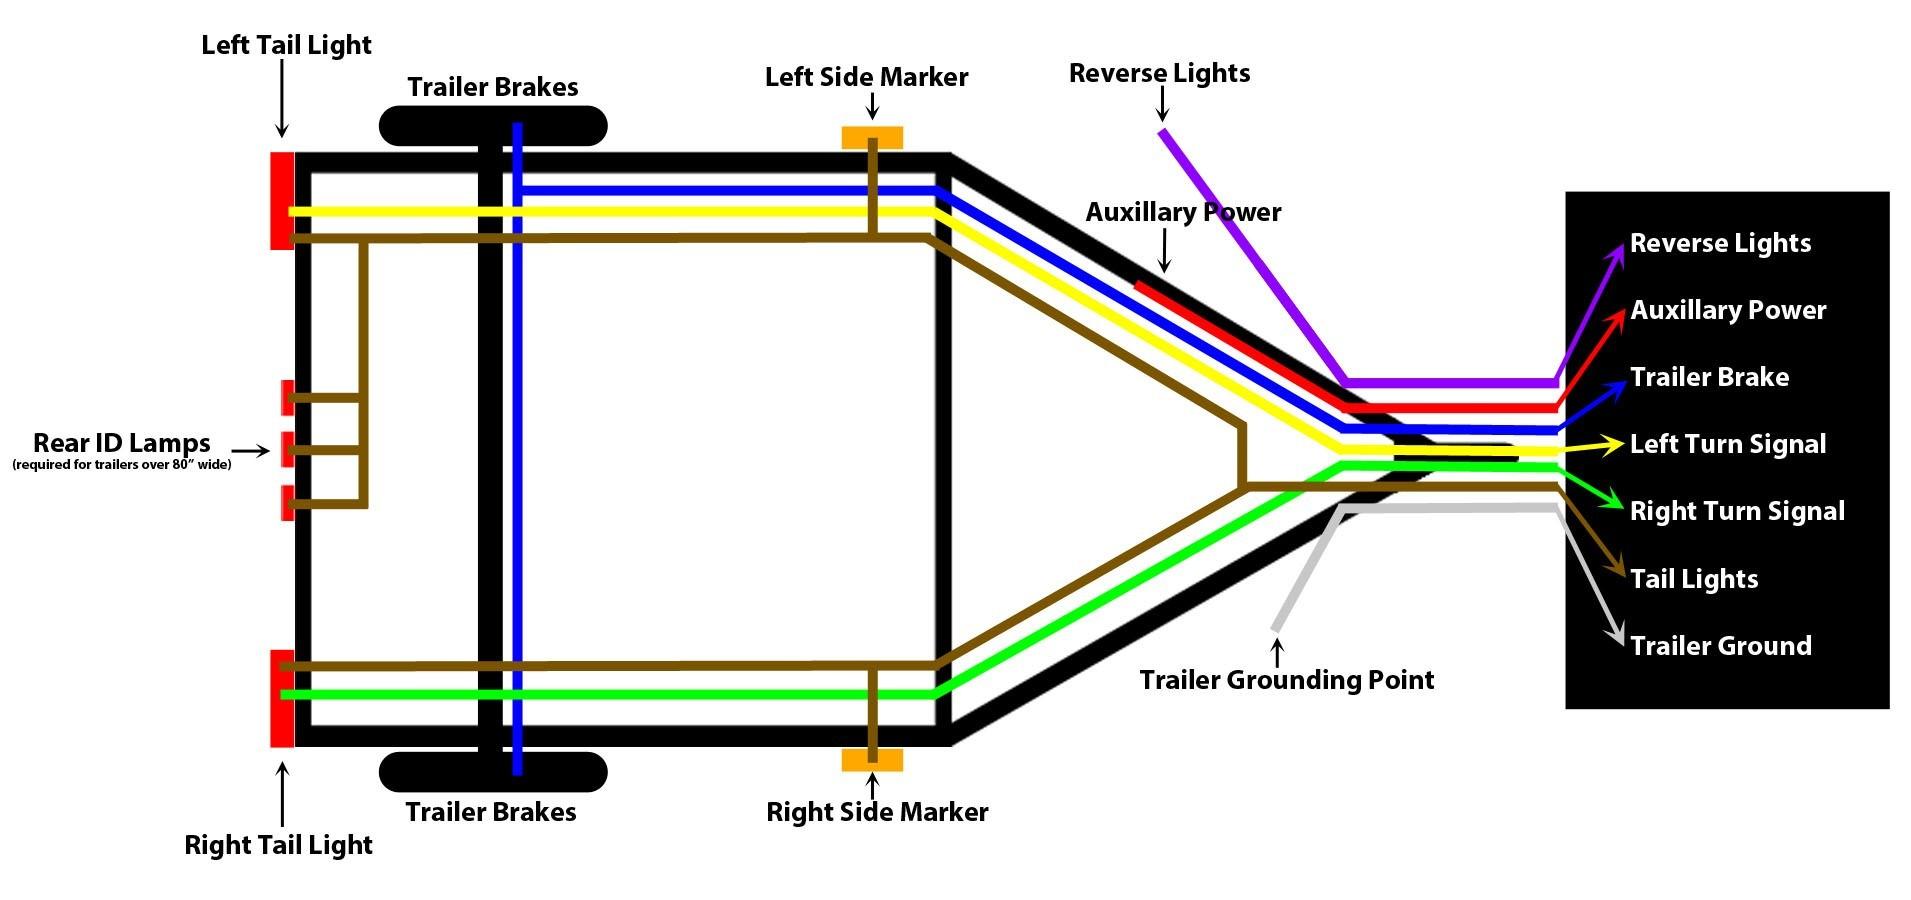 Lamp Wiring Diagram Rv Trusted Diagrams Monaco Motorhome Brake Light Trailer Lighting Image Converter